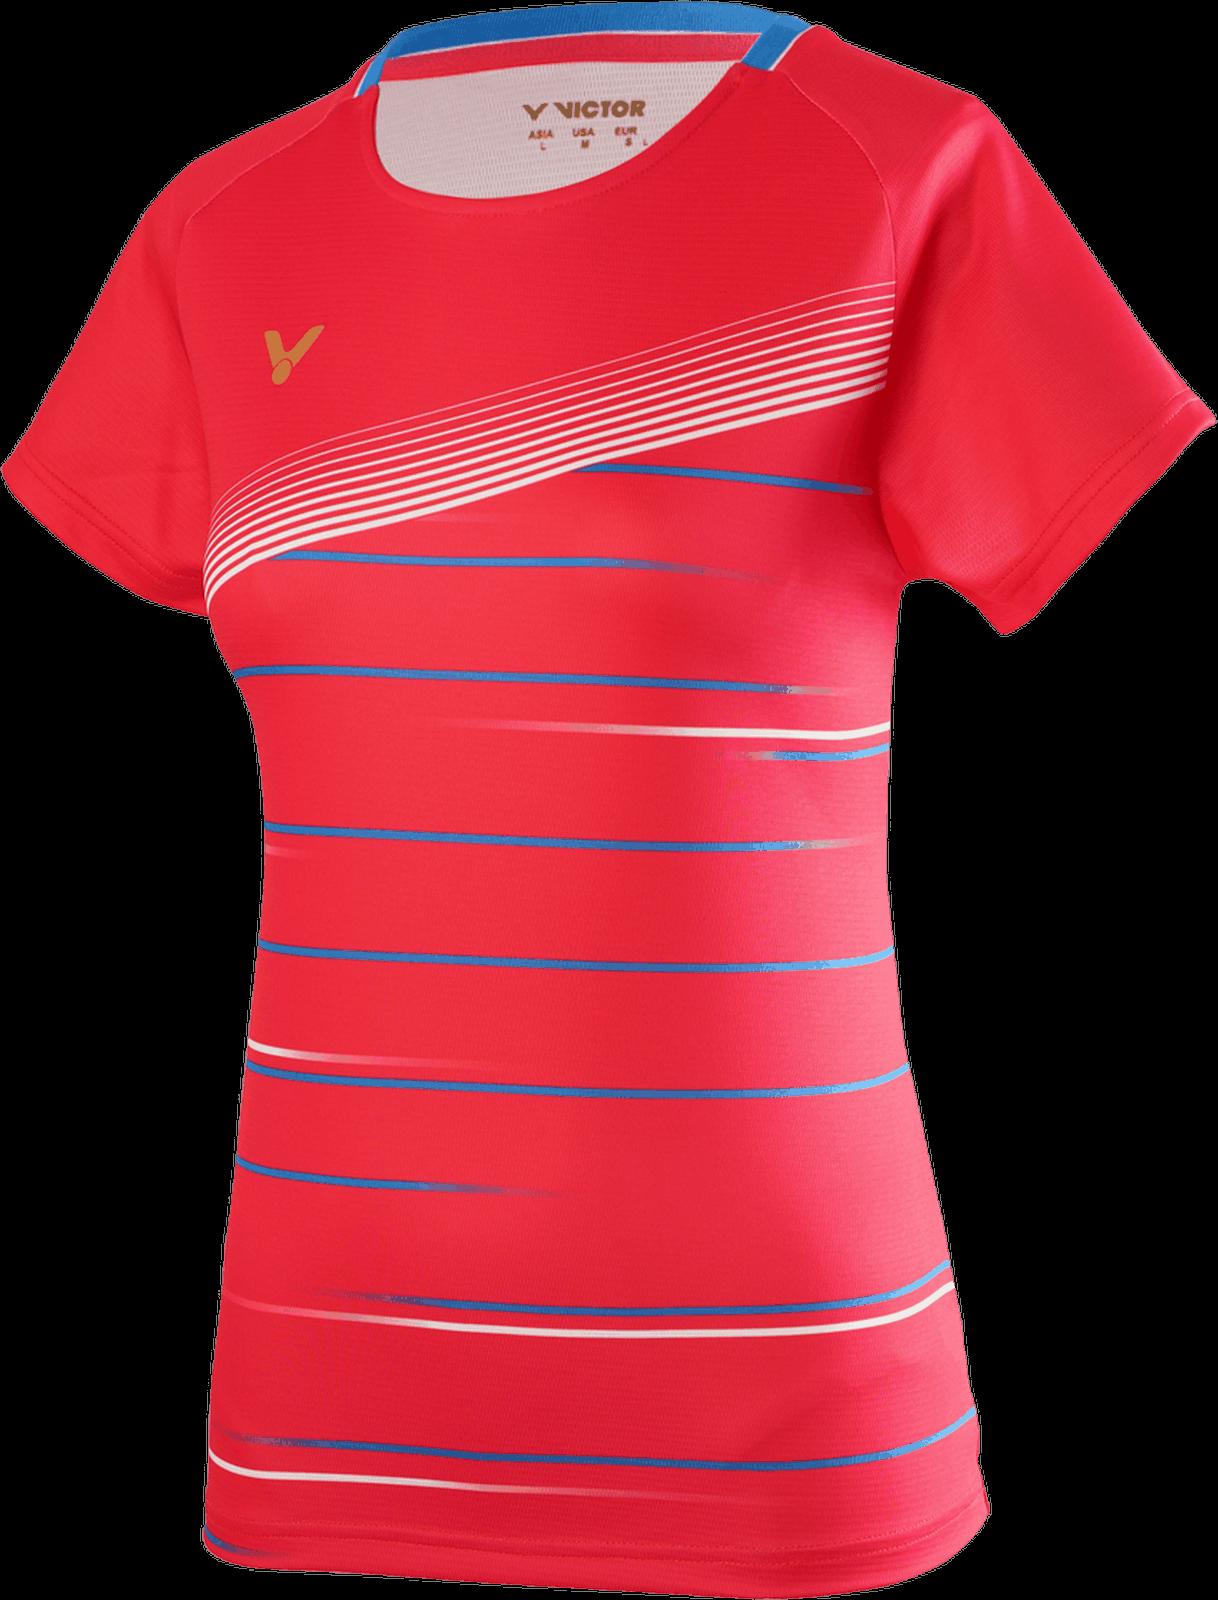 VICTOR T-Shirt T-01003 D